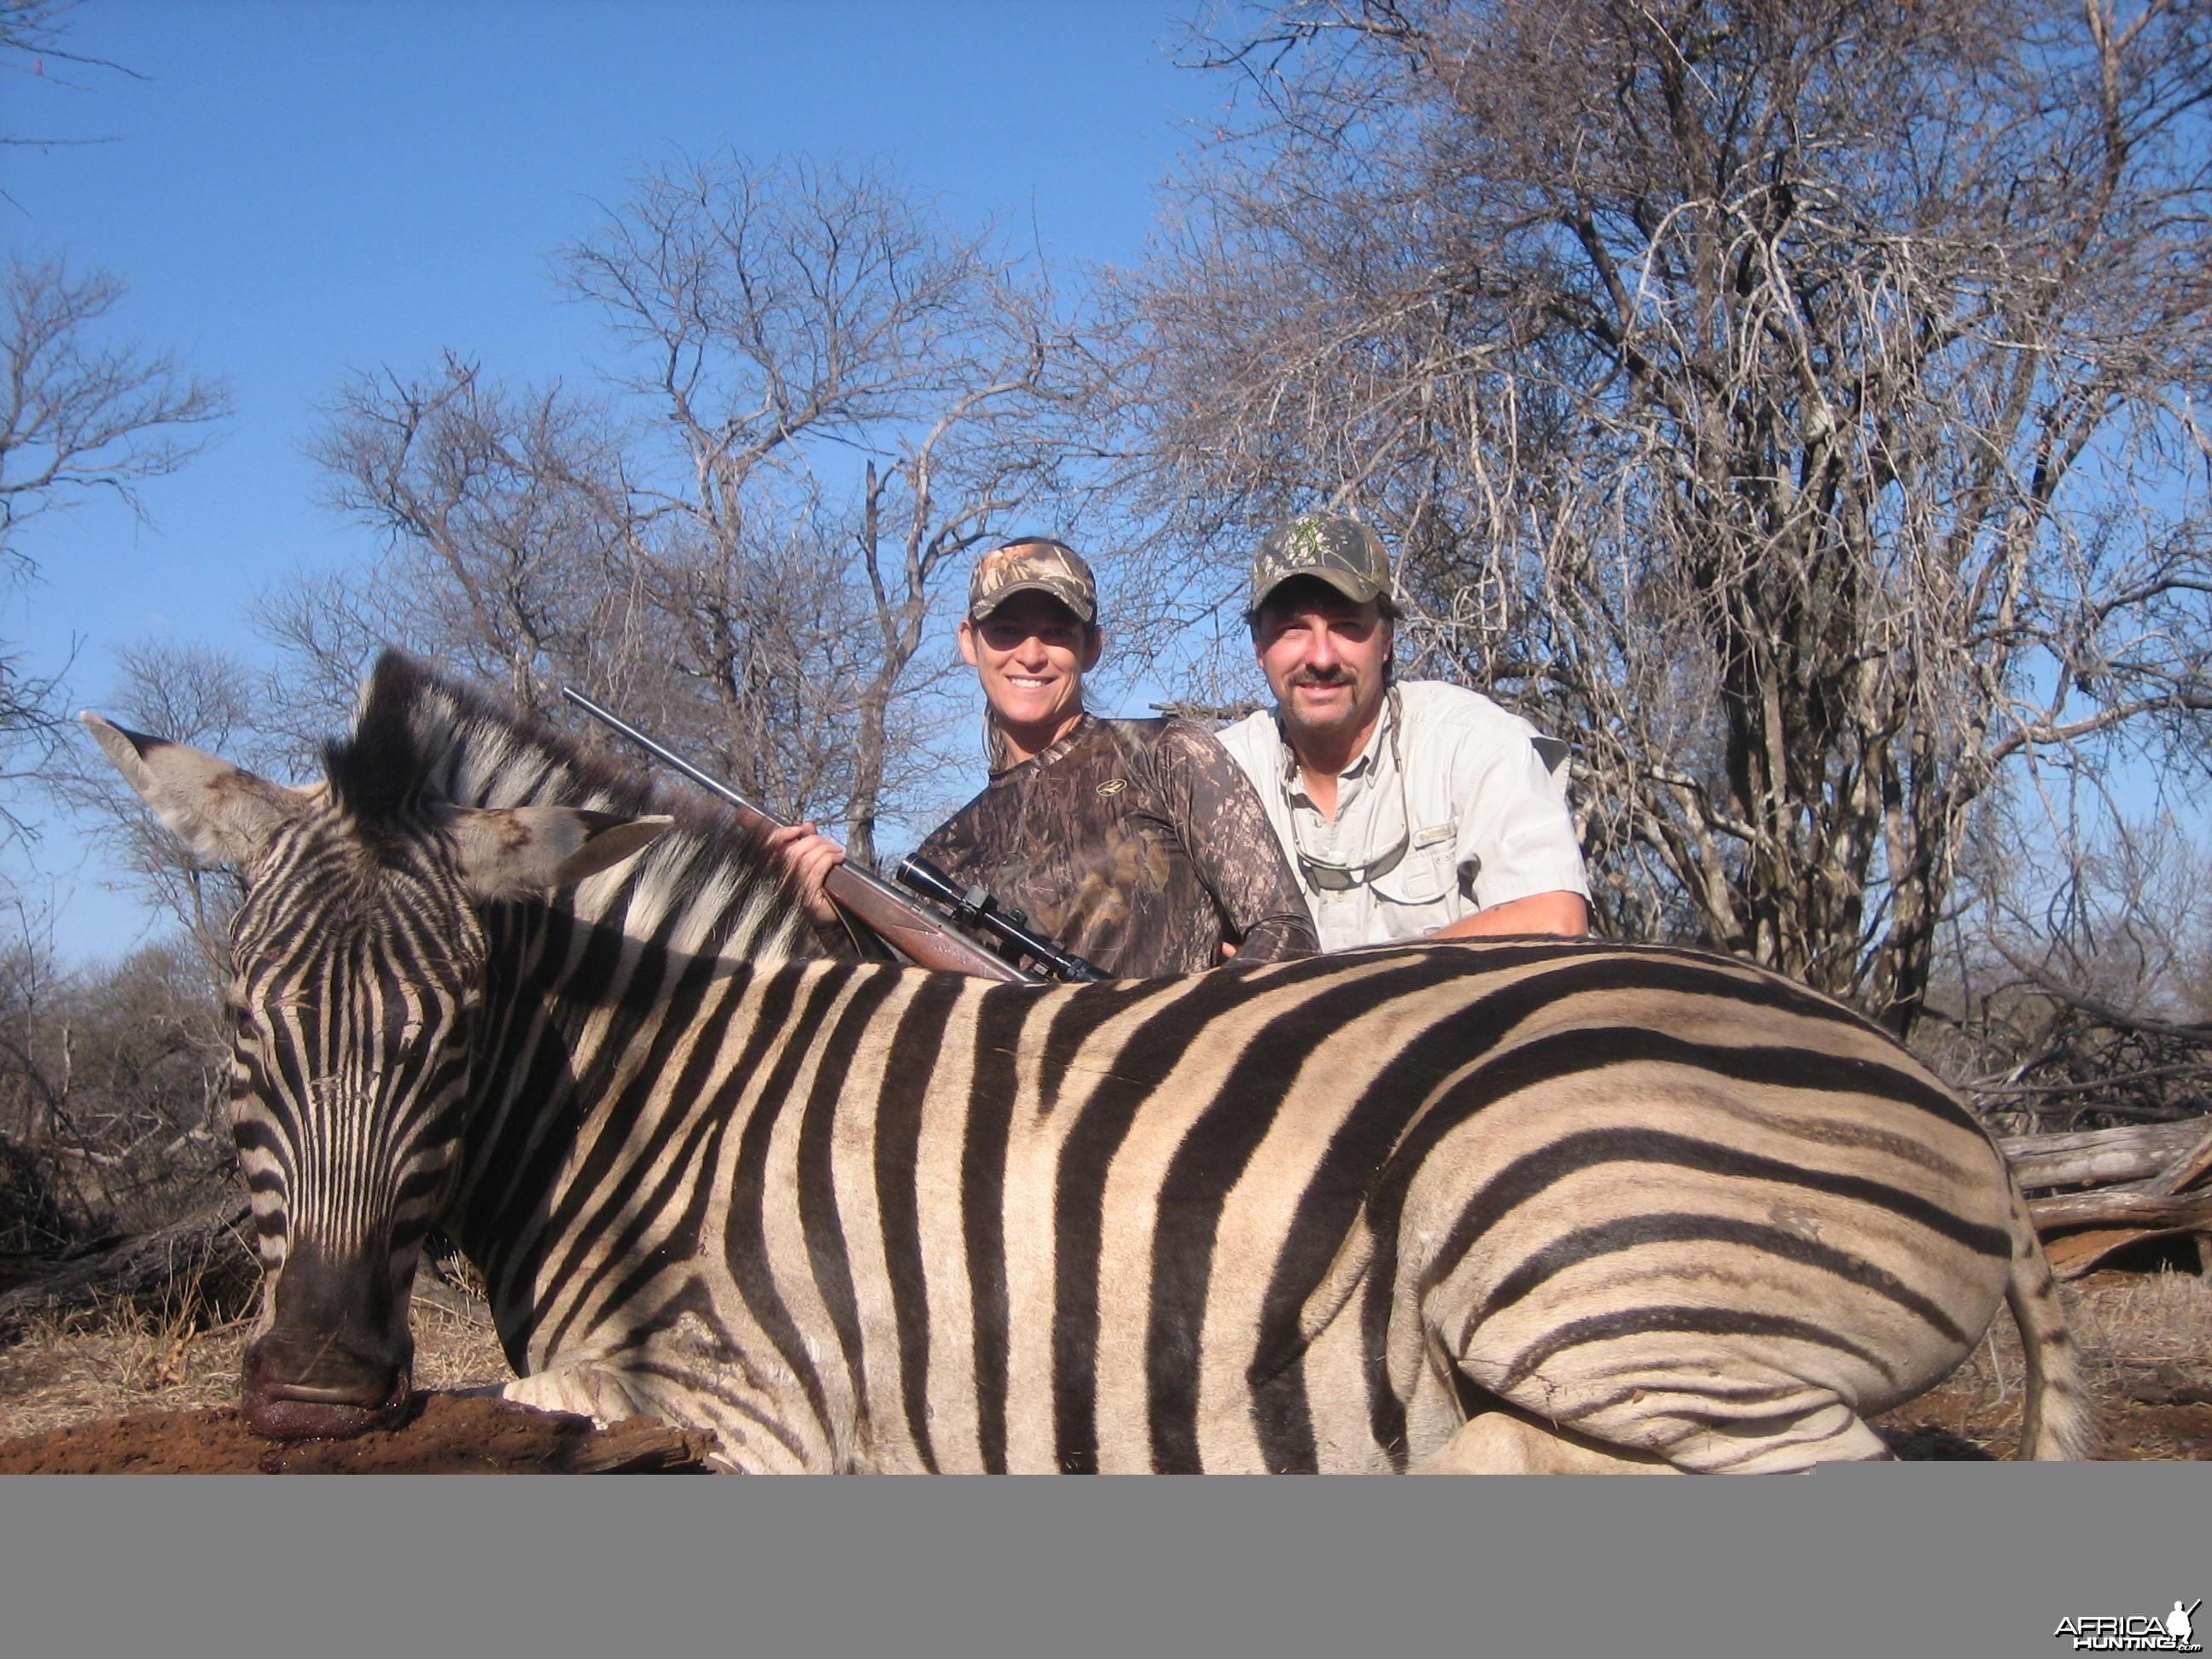 Lisa's Zebra. Limcroma Safaris 2009